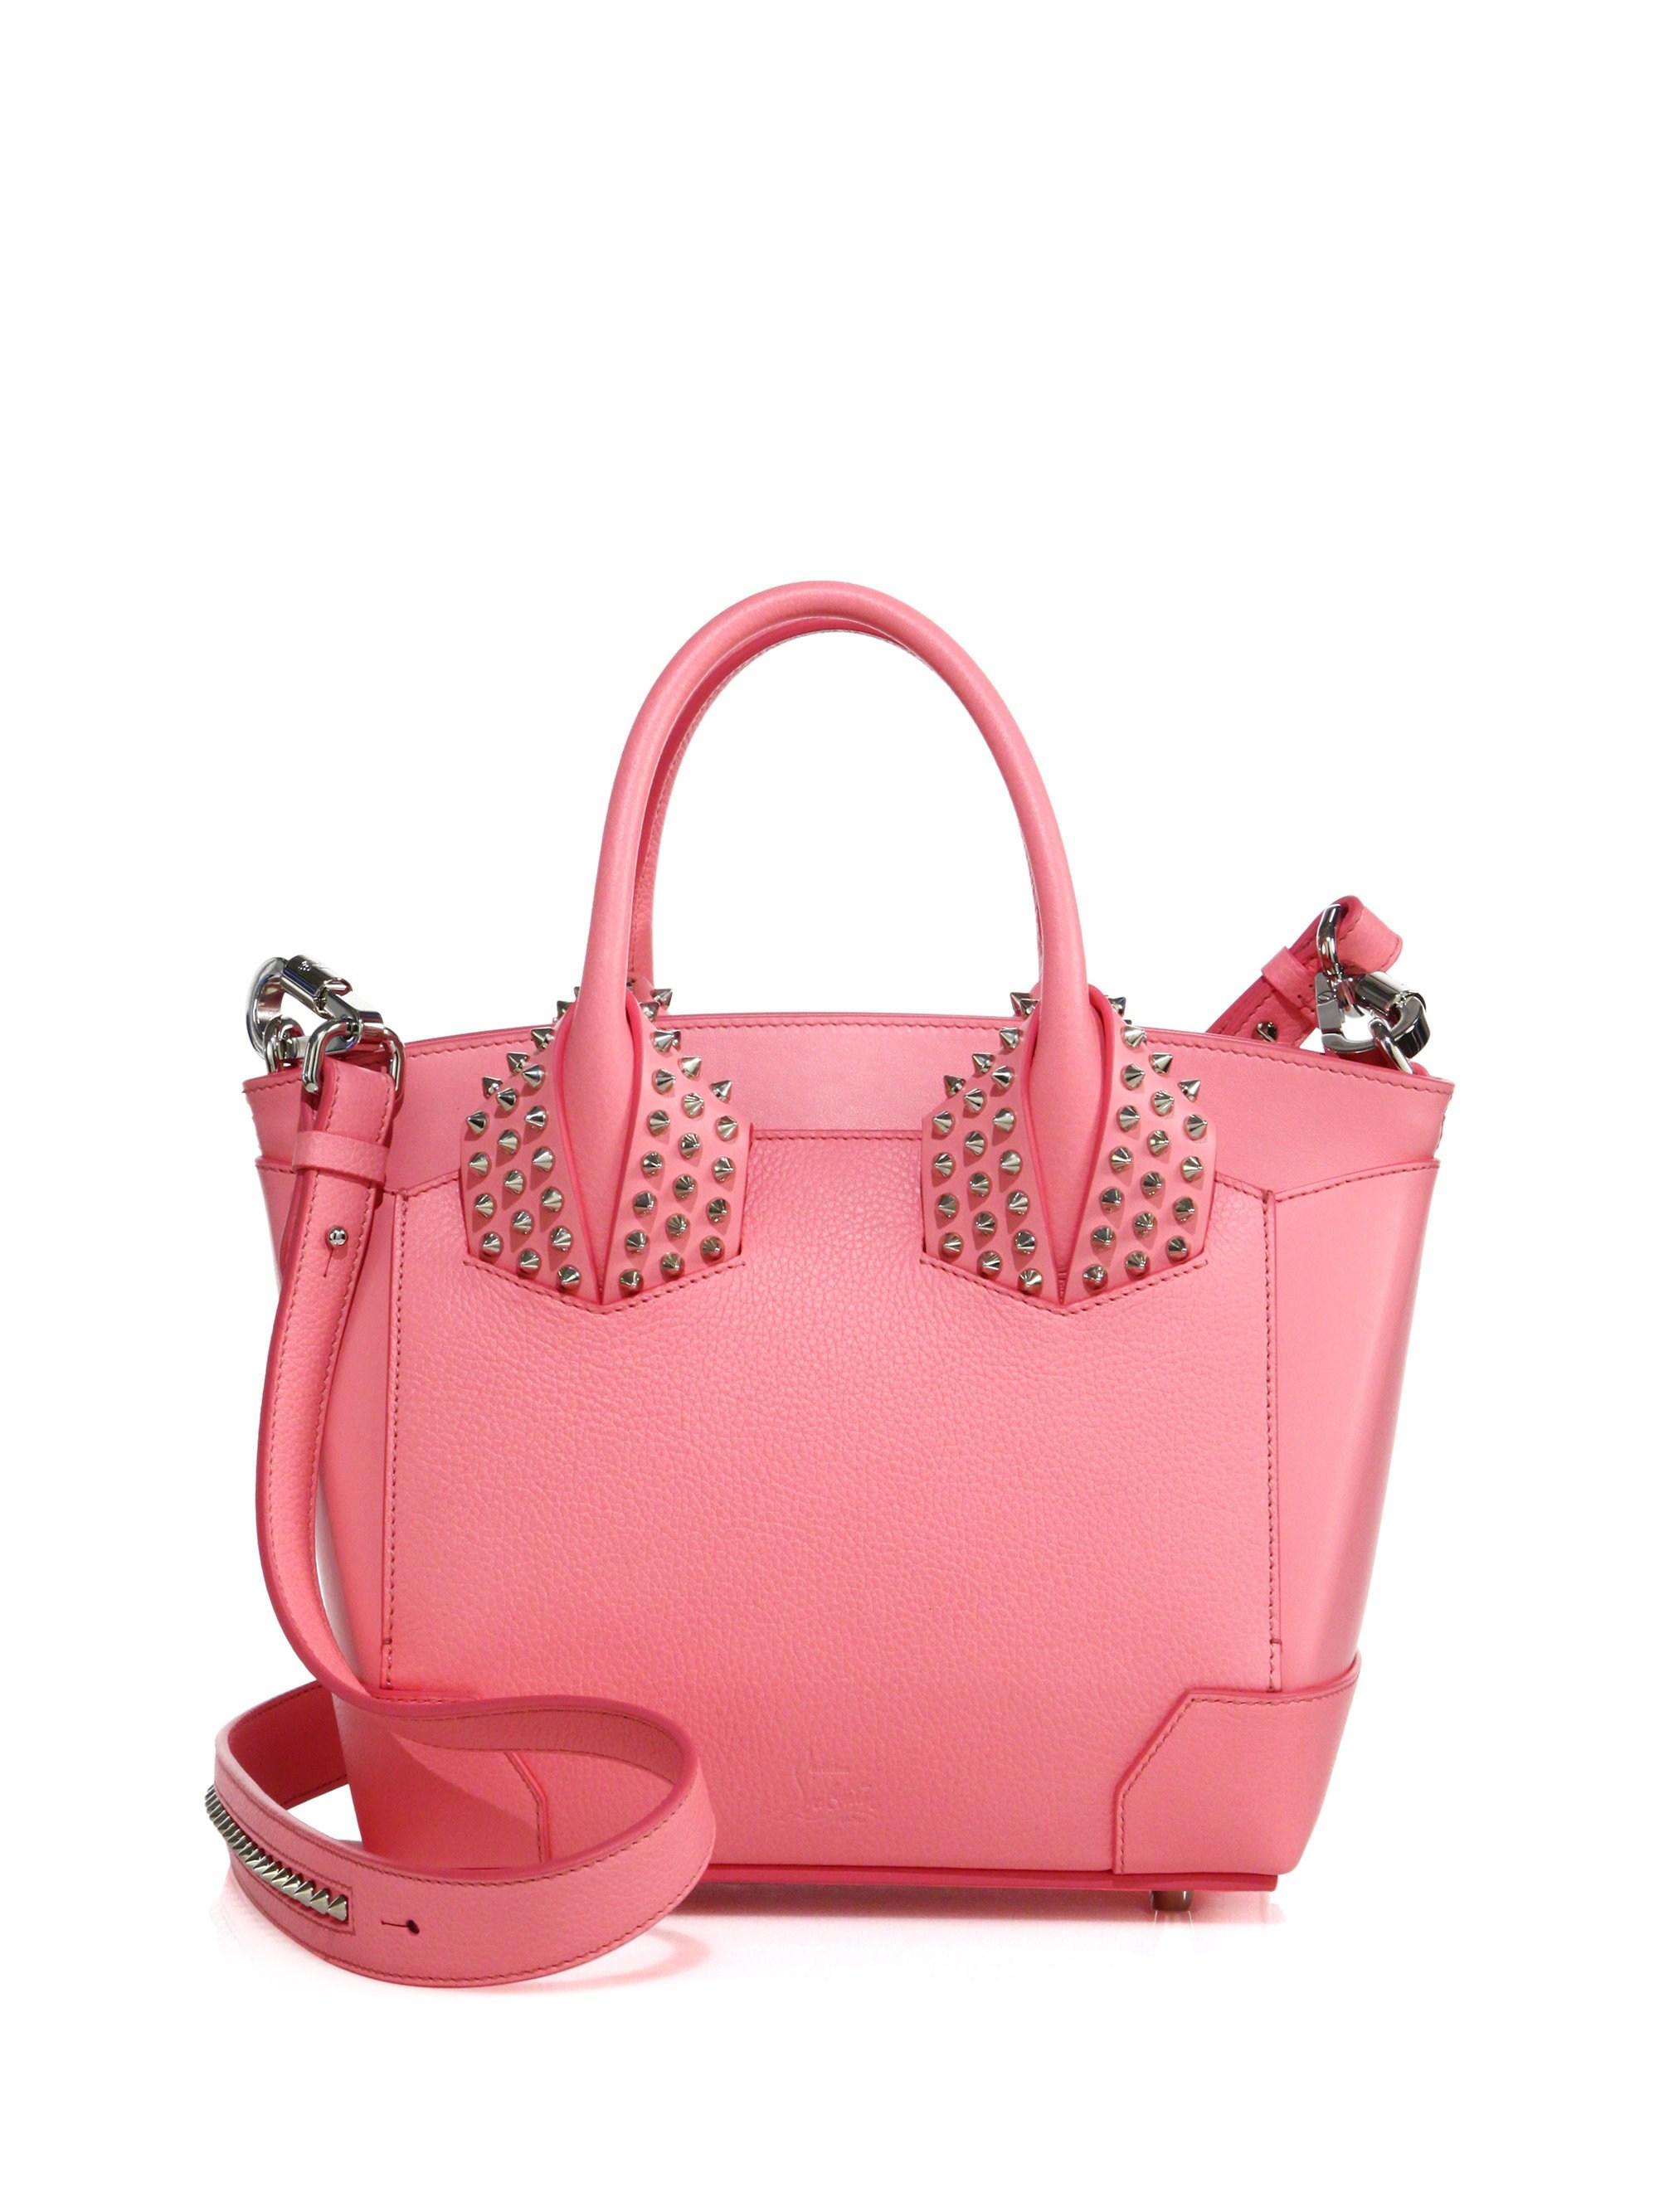 5ad401c520c Christian Louboutin Women's Eloise Small Studded Leather Satchel ...